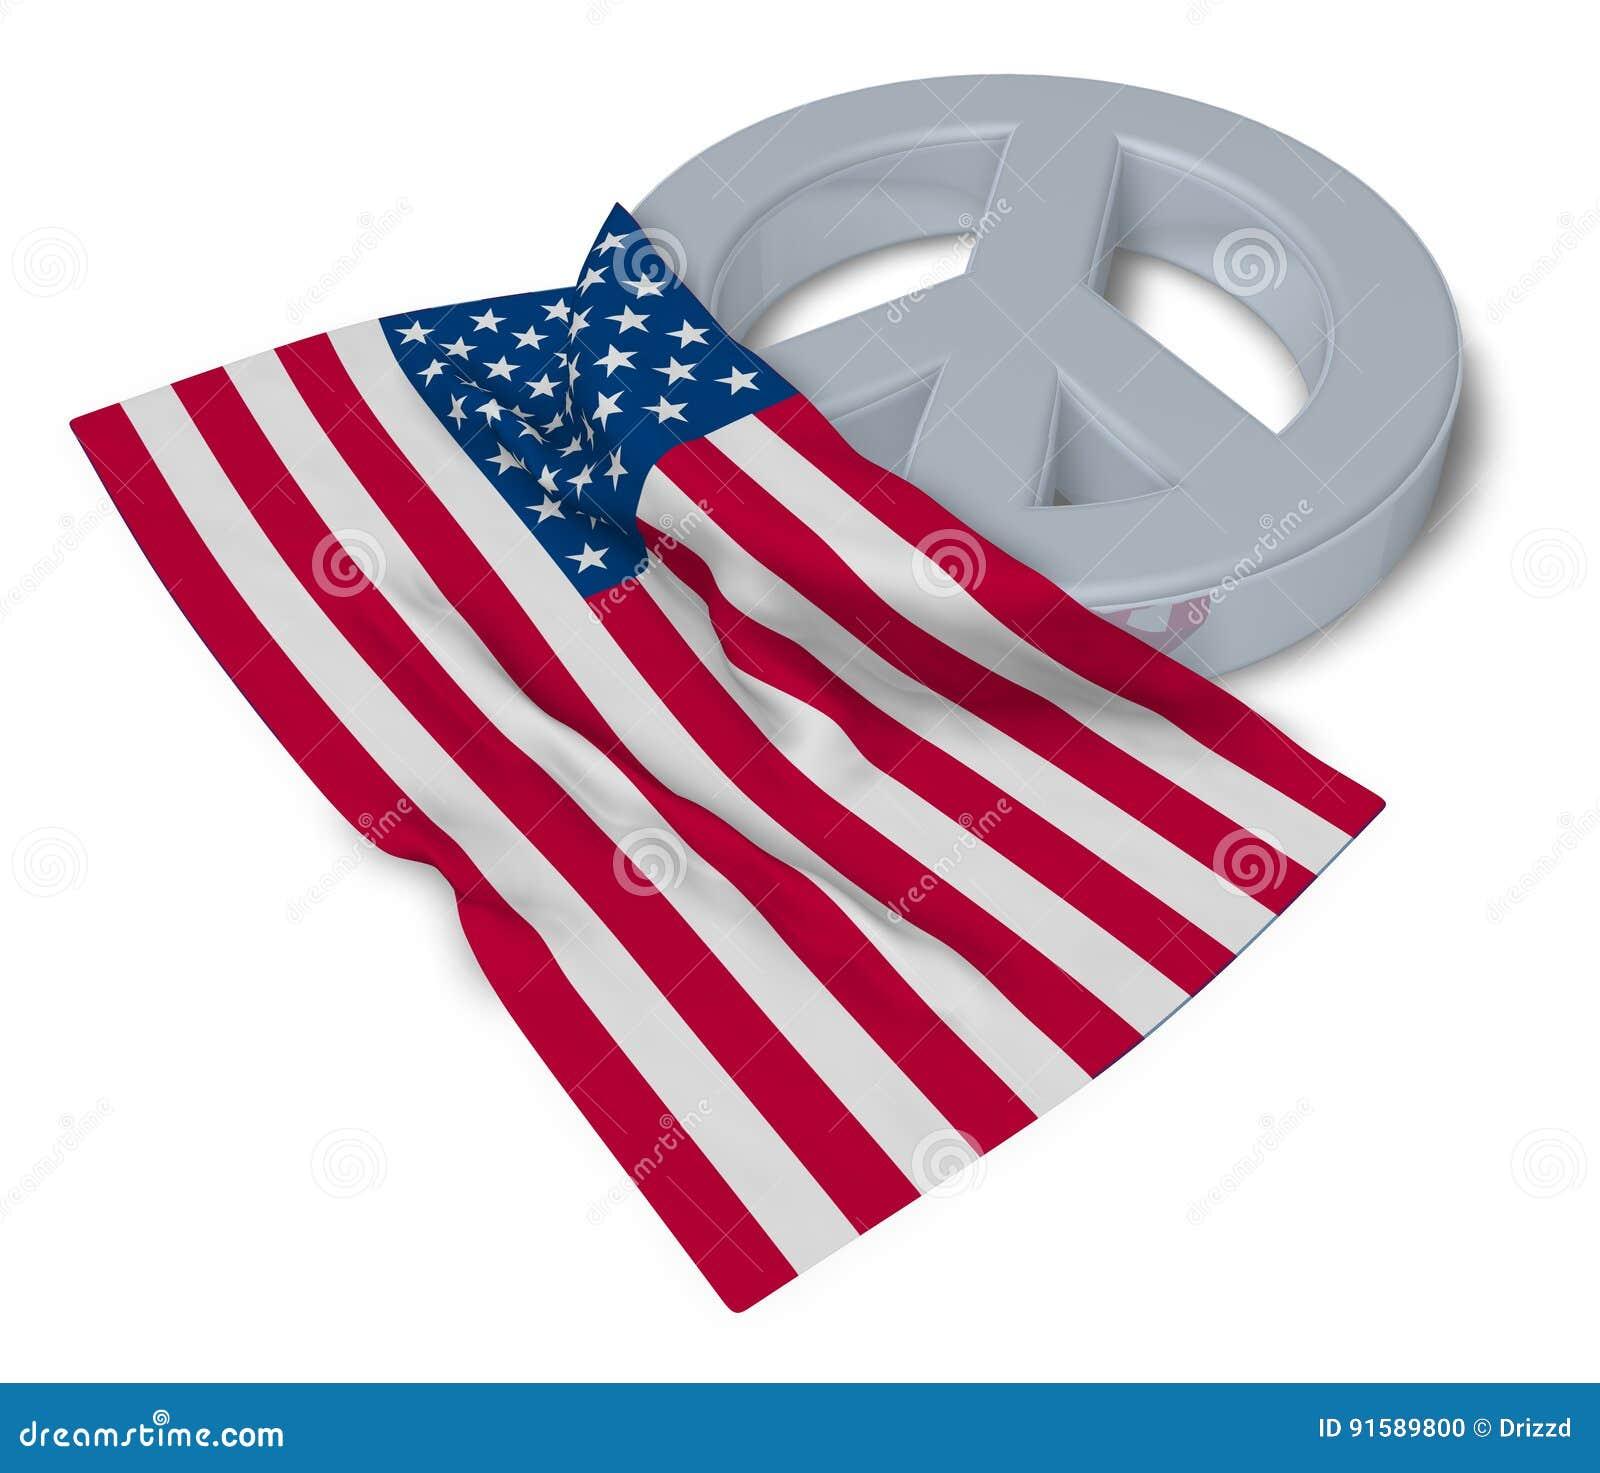 Peace symbol and flag of the usa stock illustration illustration peace symbol and flag of the usa biocorpaavc